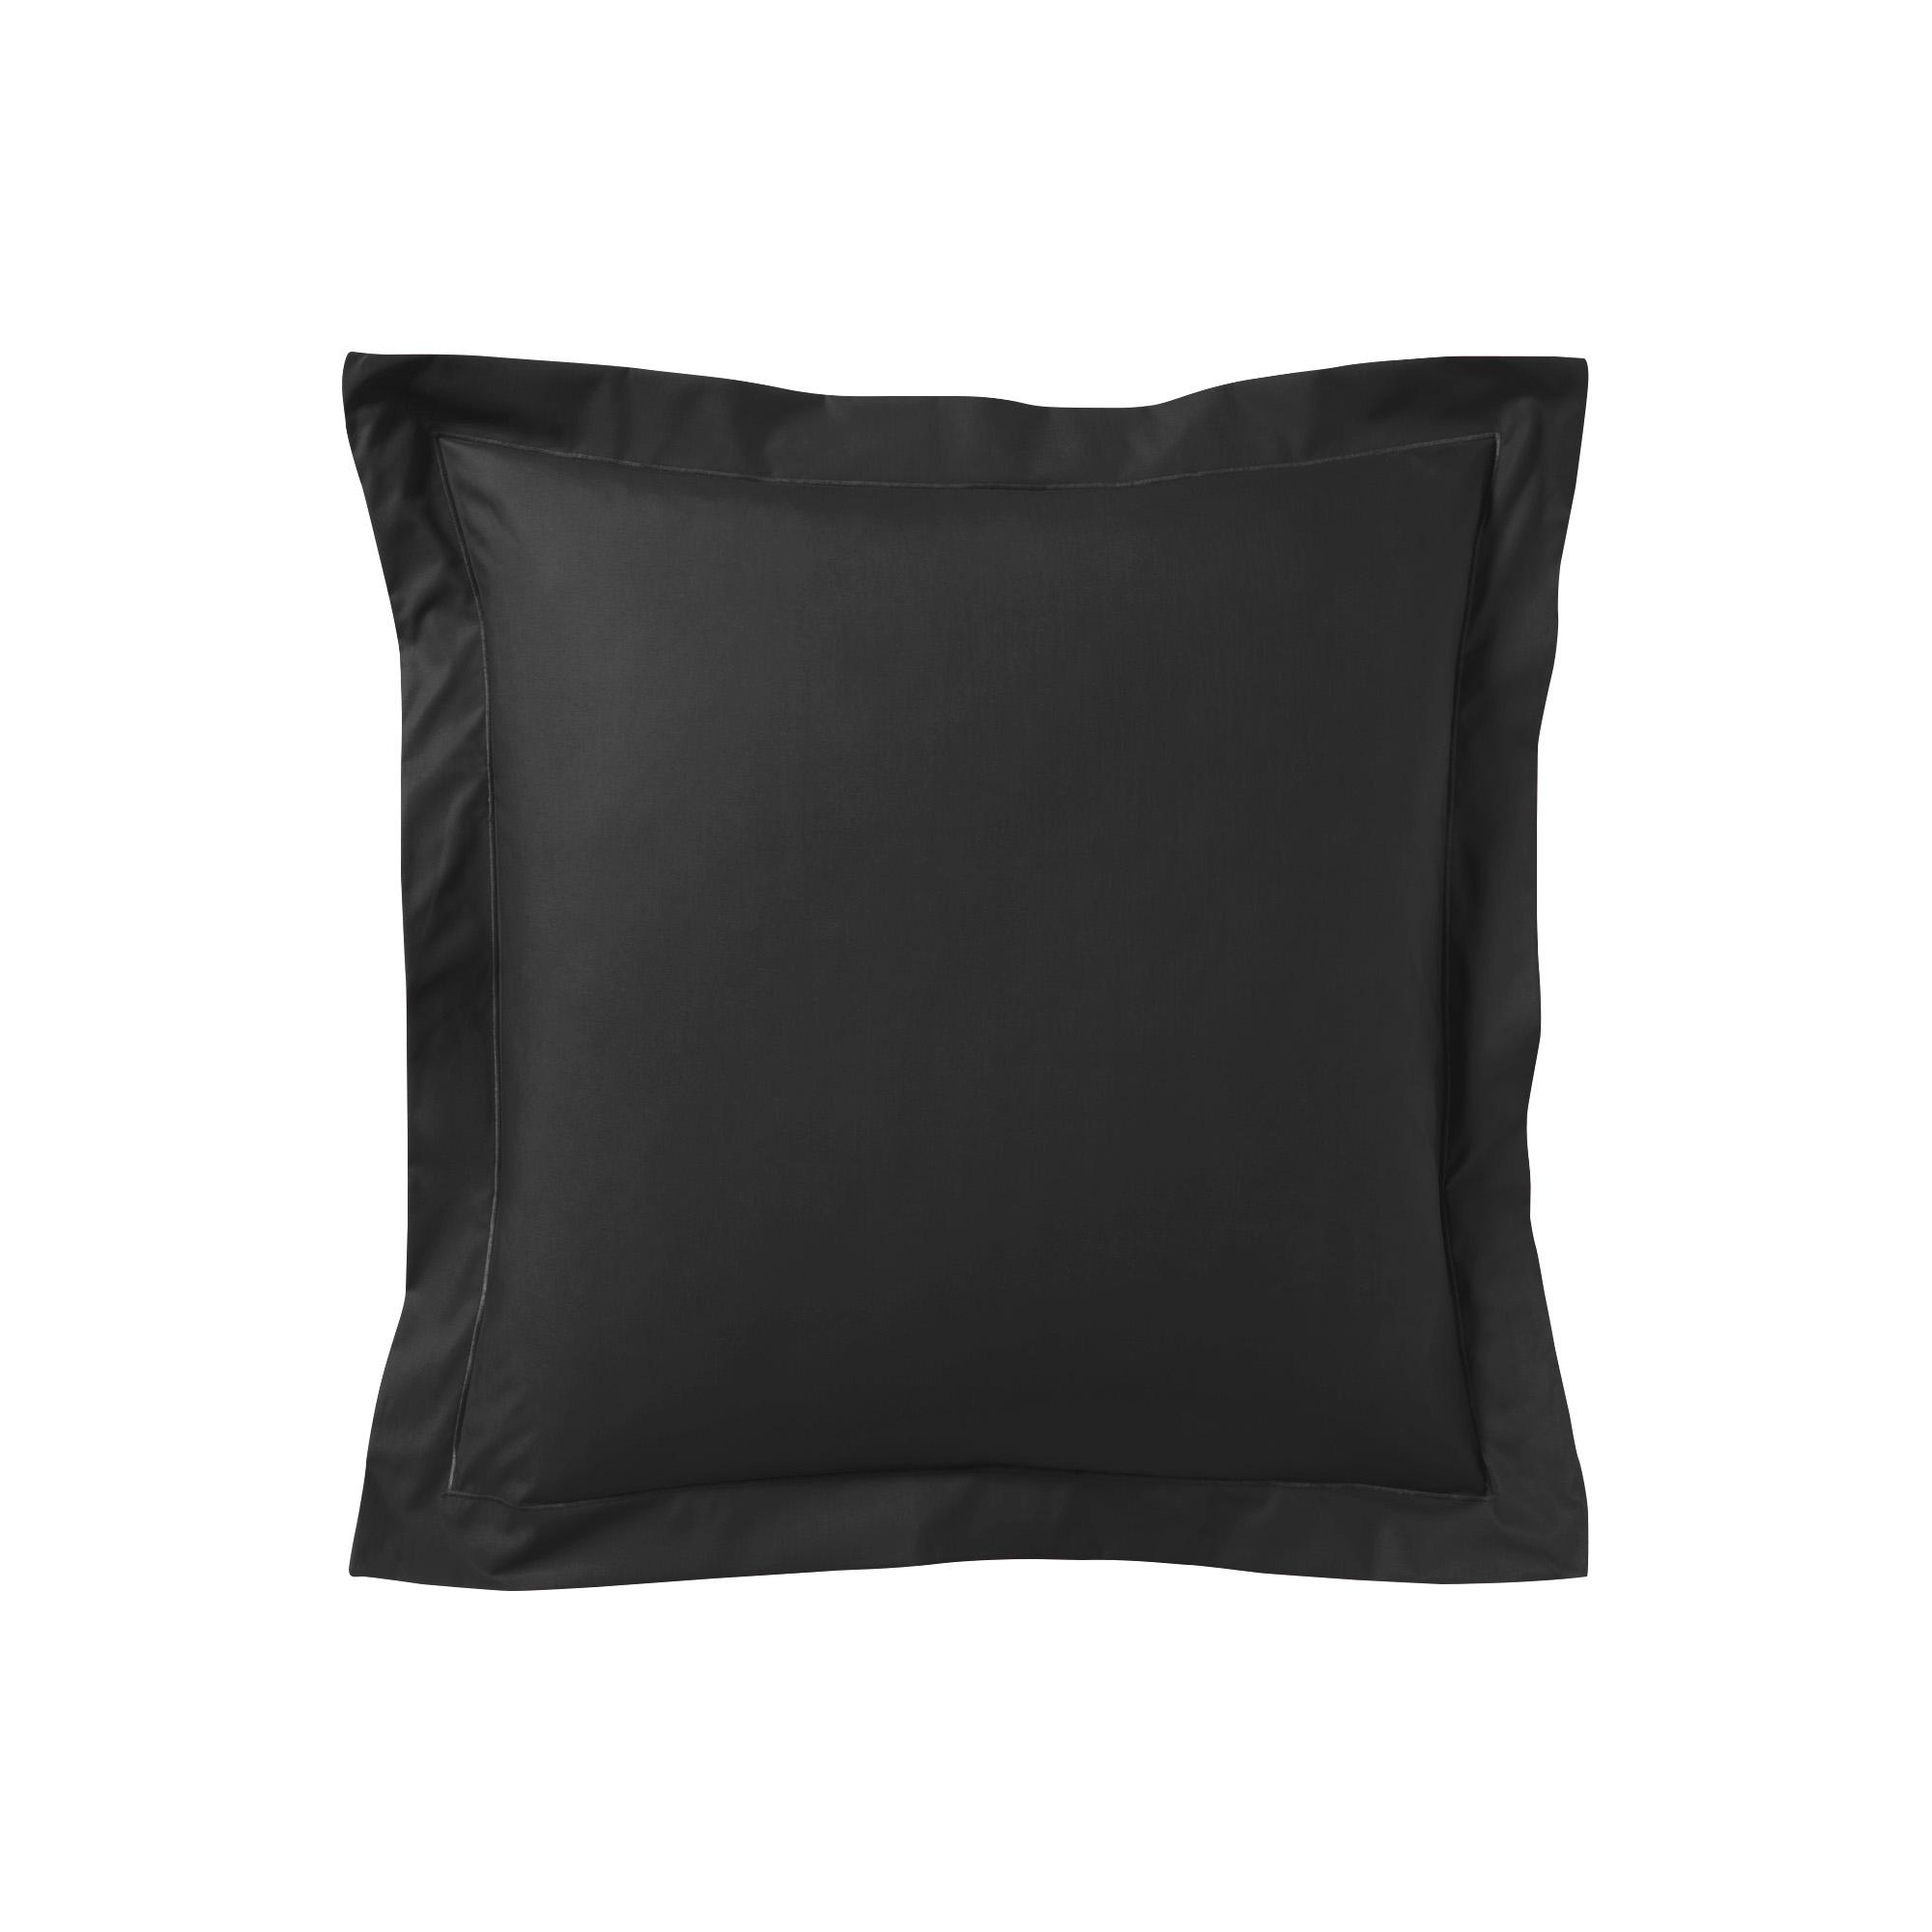 Taie d'oreiller unie en percale de coton gris 64x64